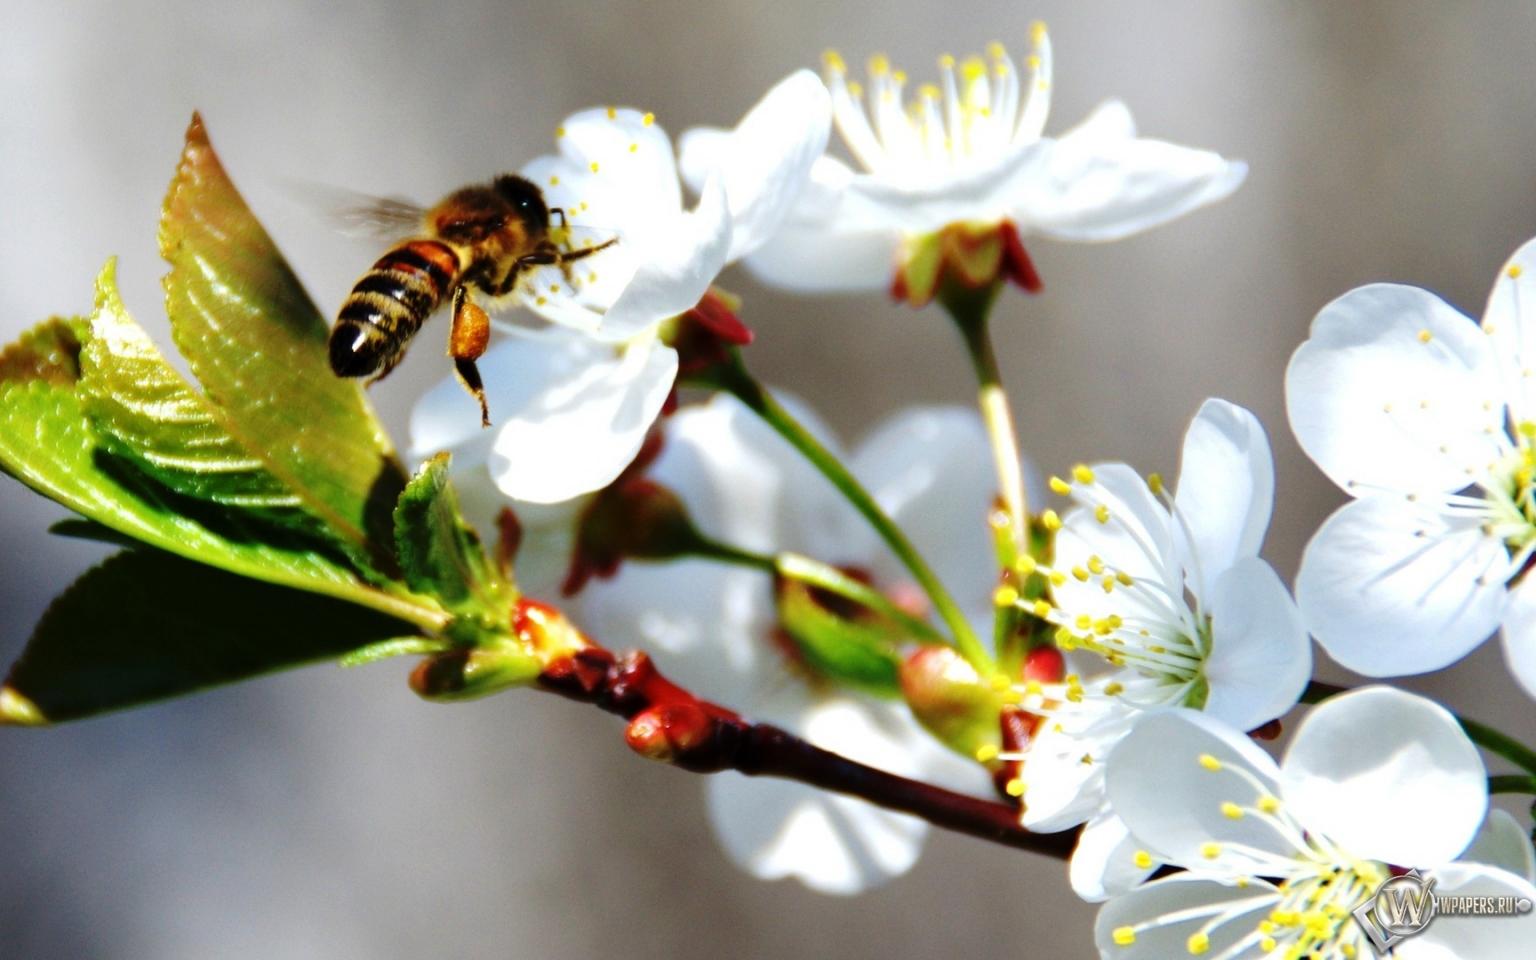 Пчела на черемухе 1536x960